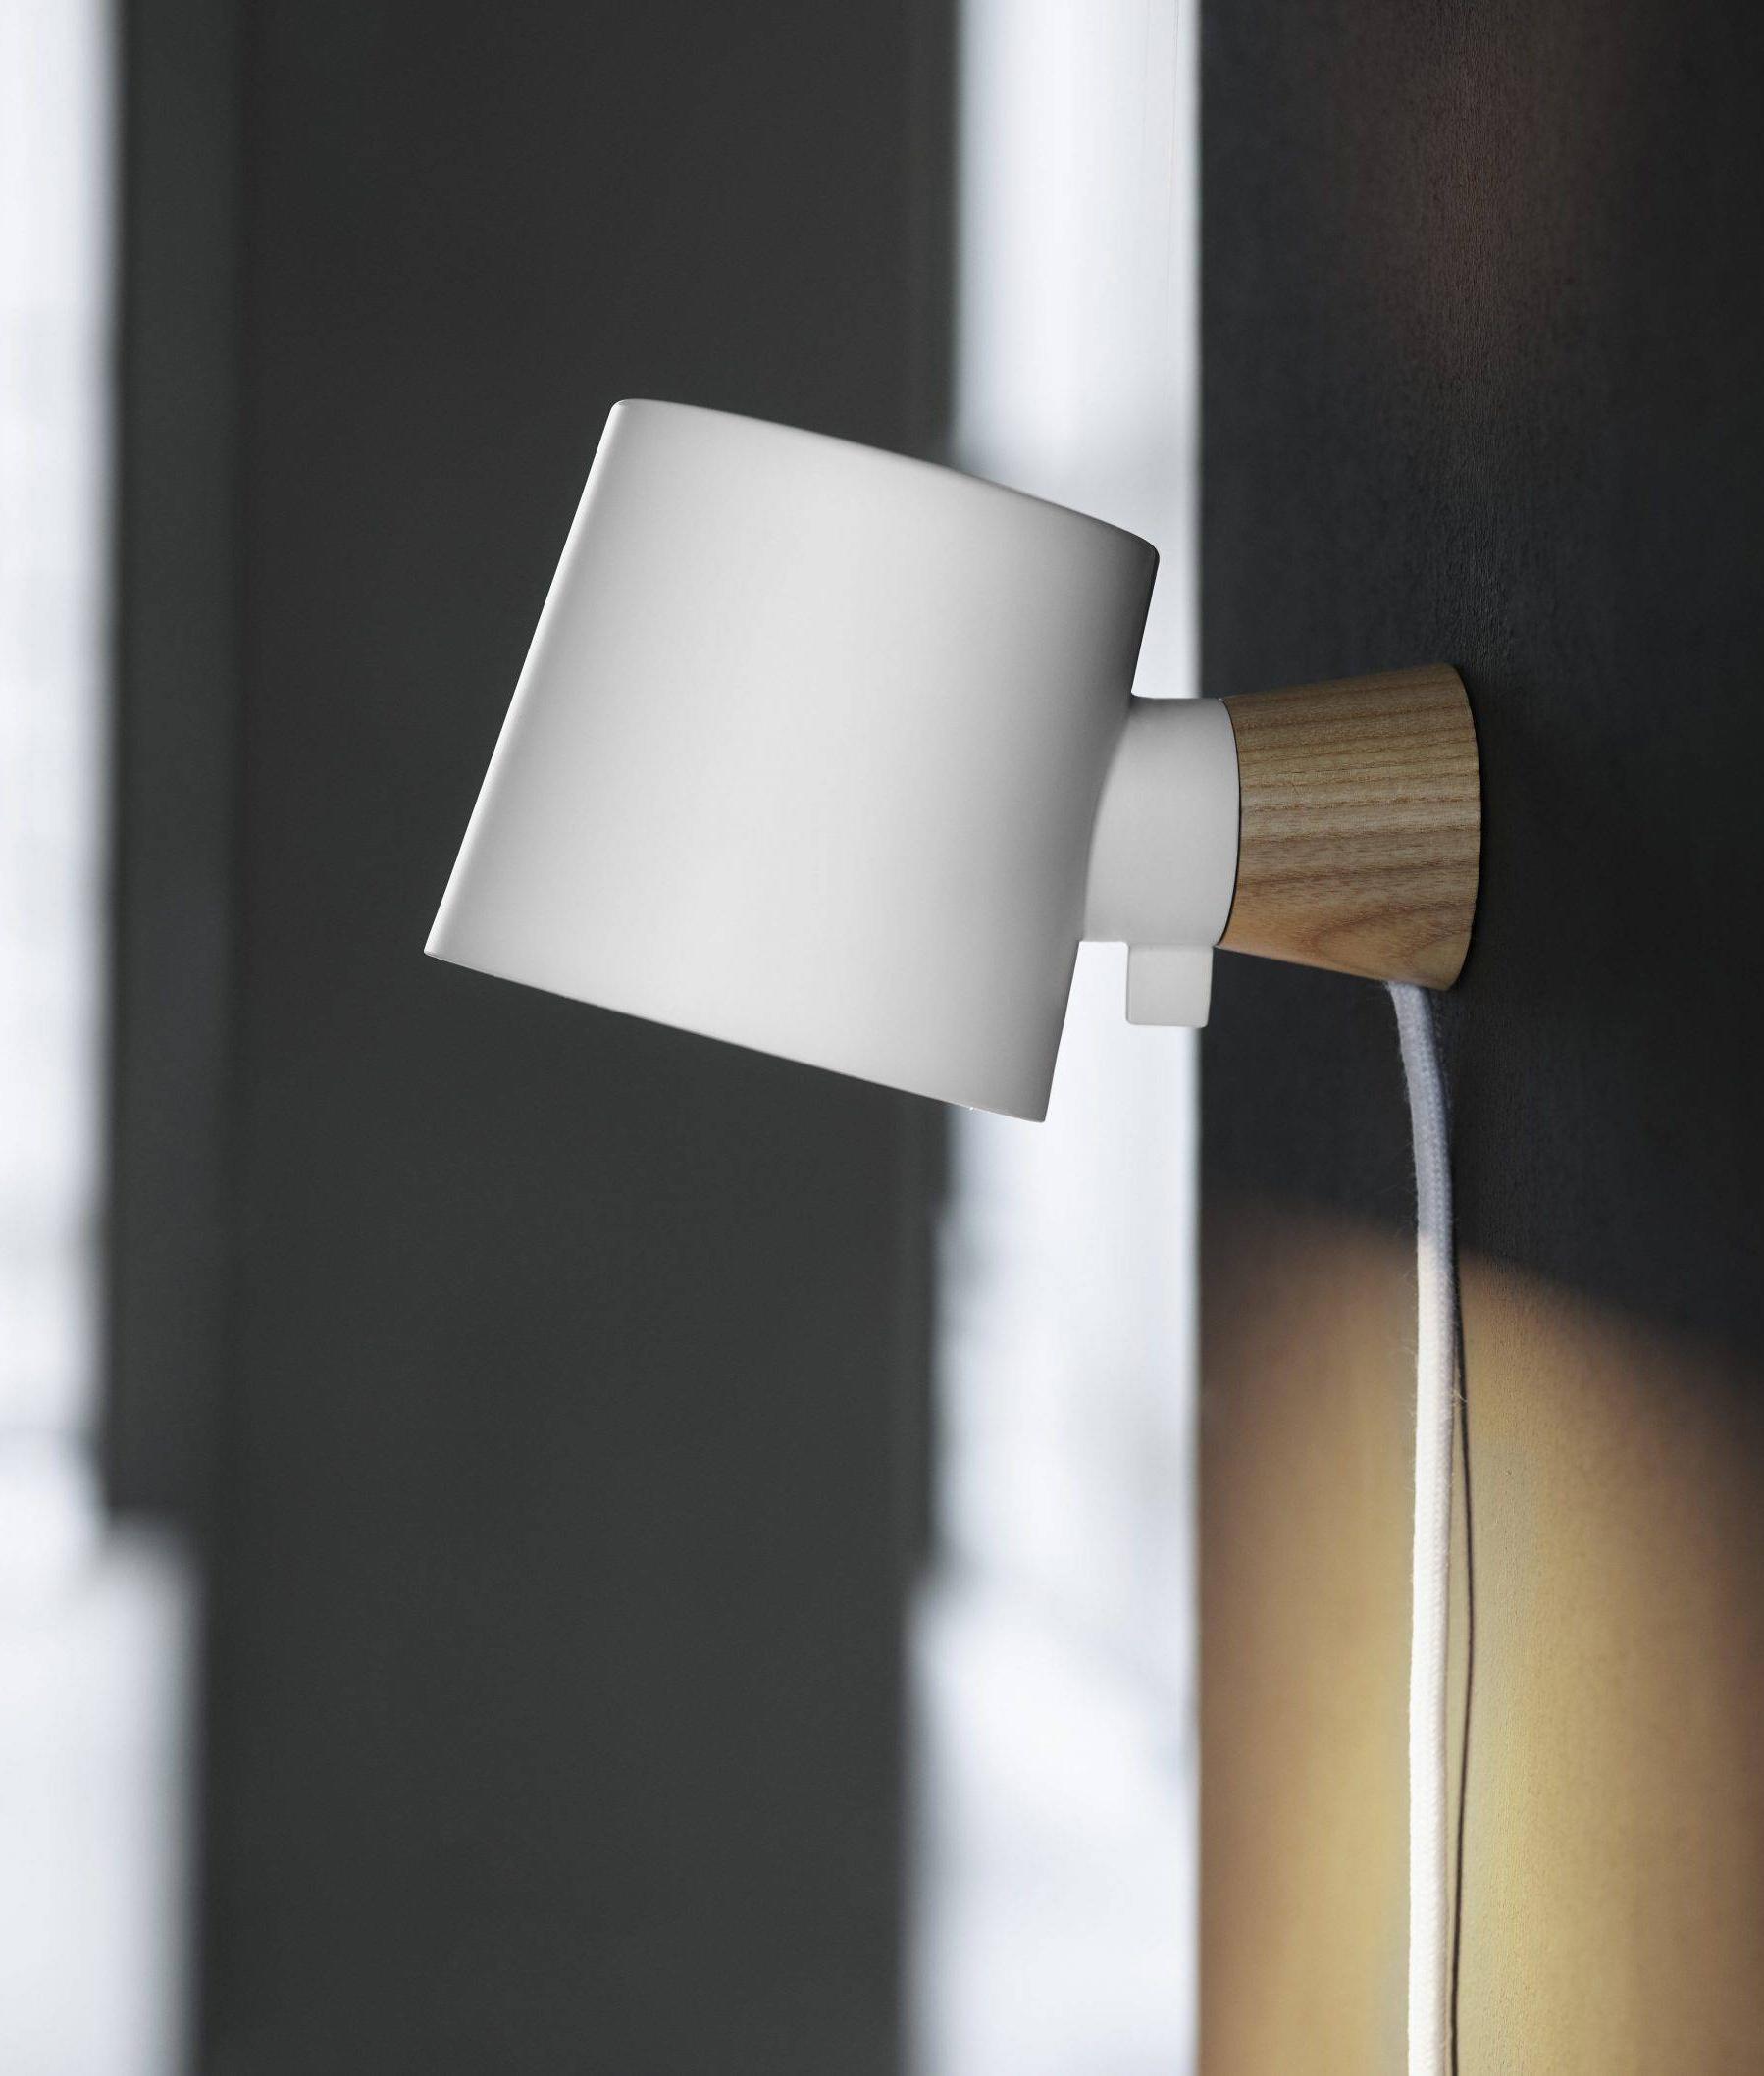 Trailing Lead Rise Wall Lamp